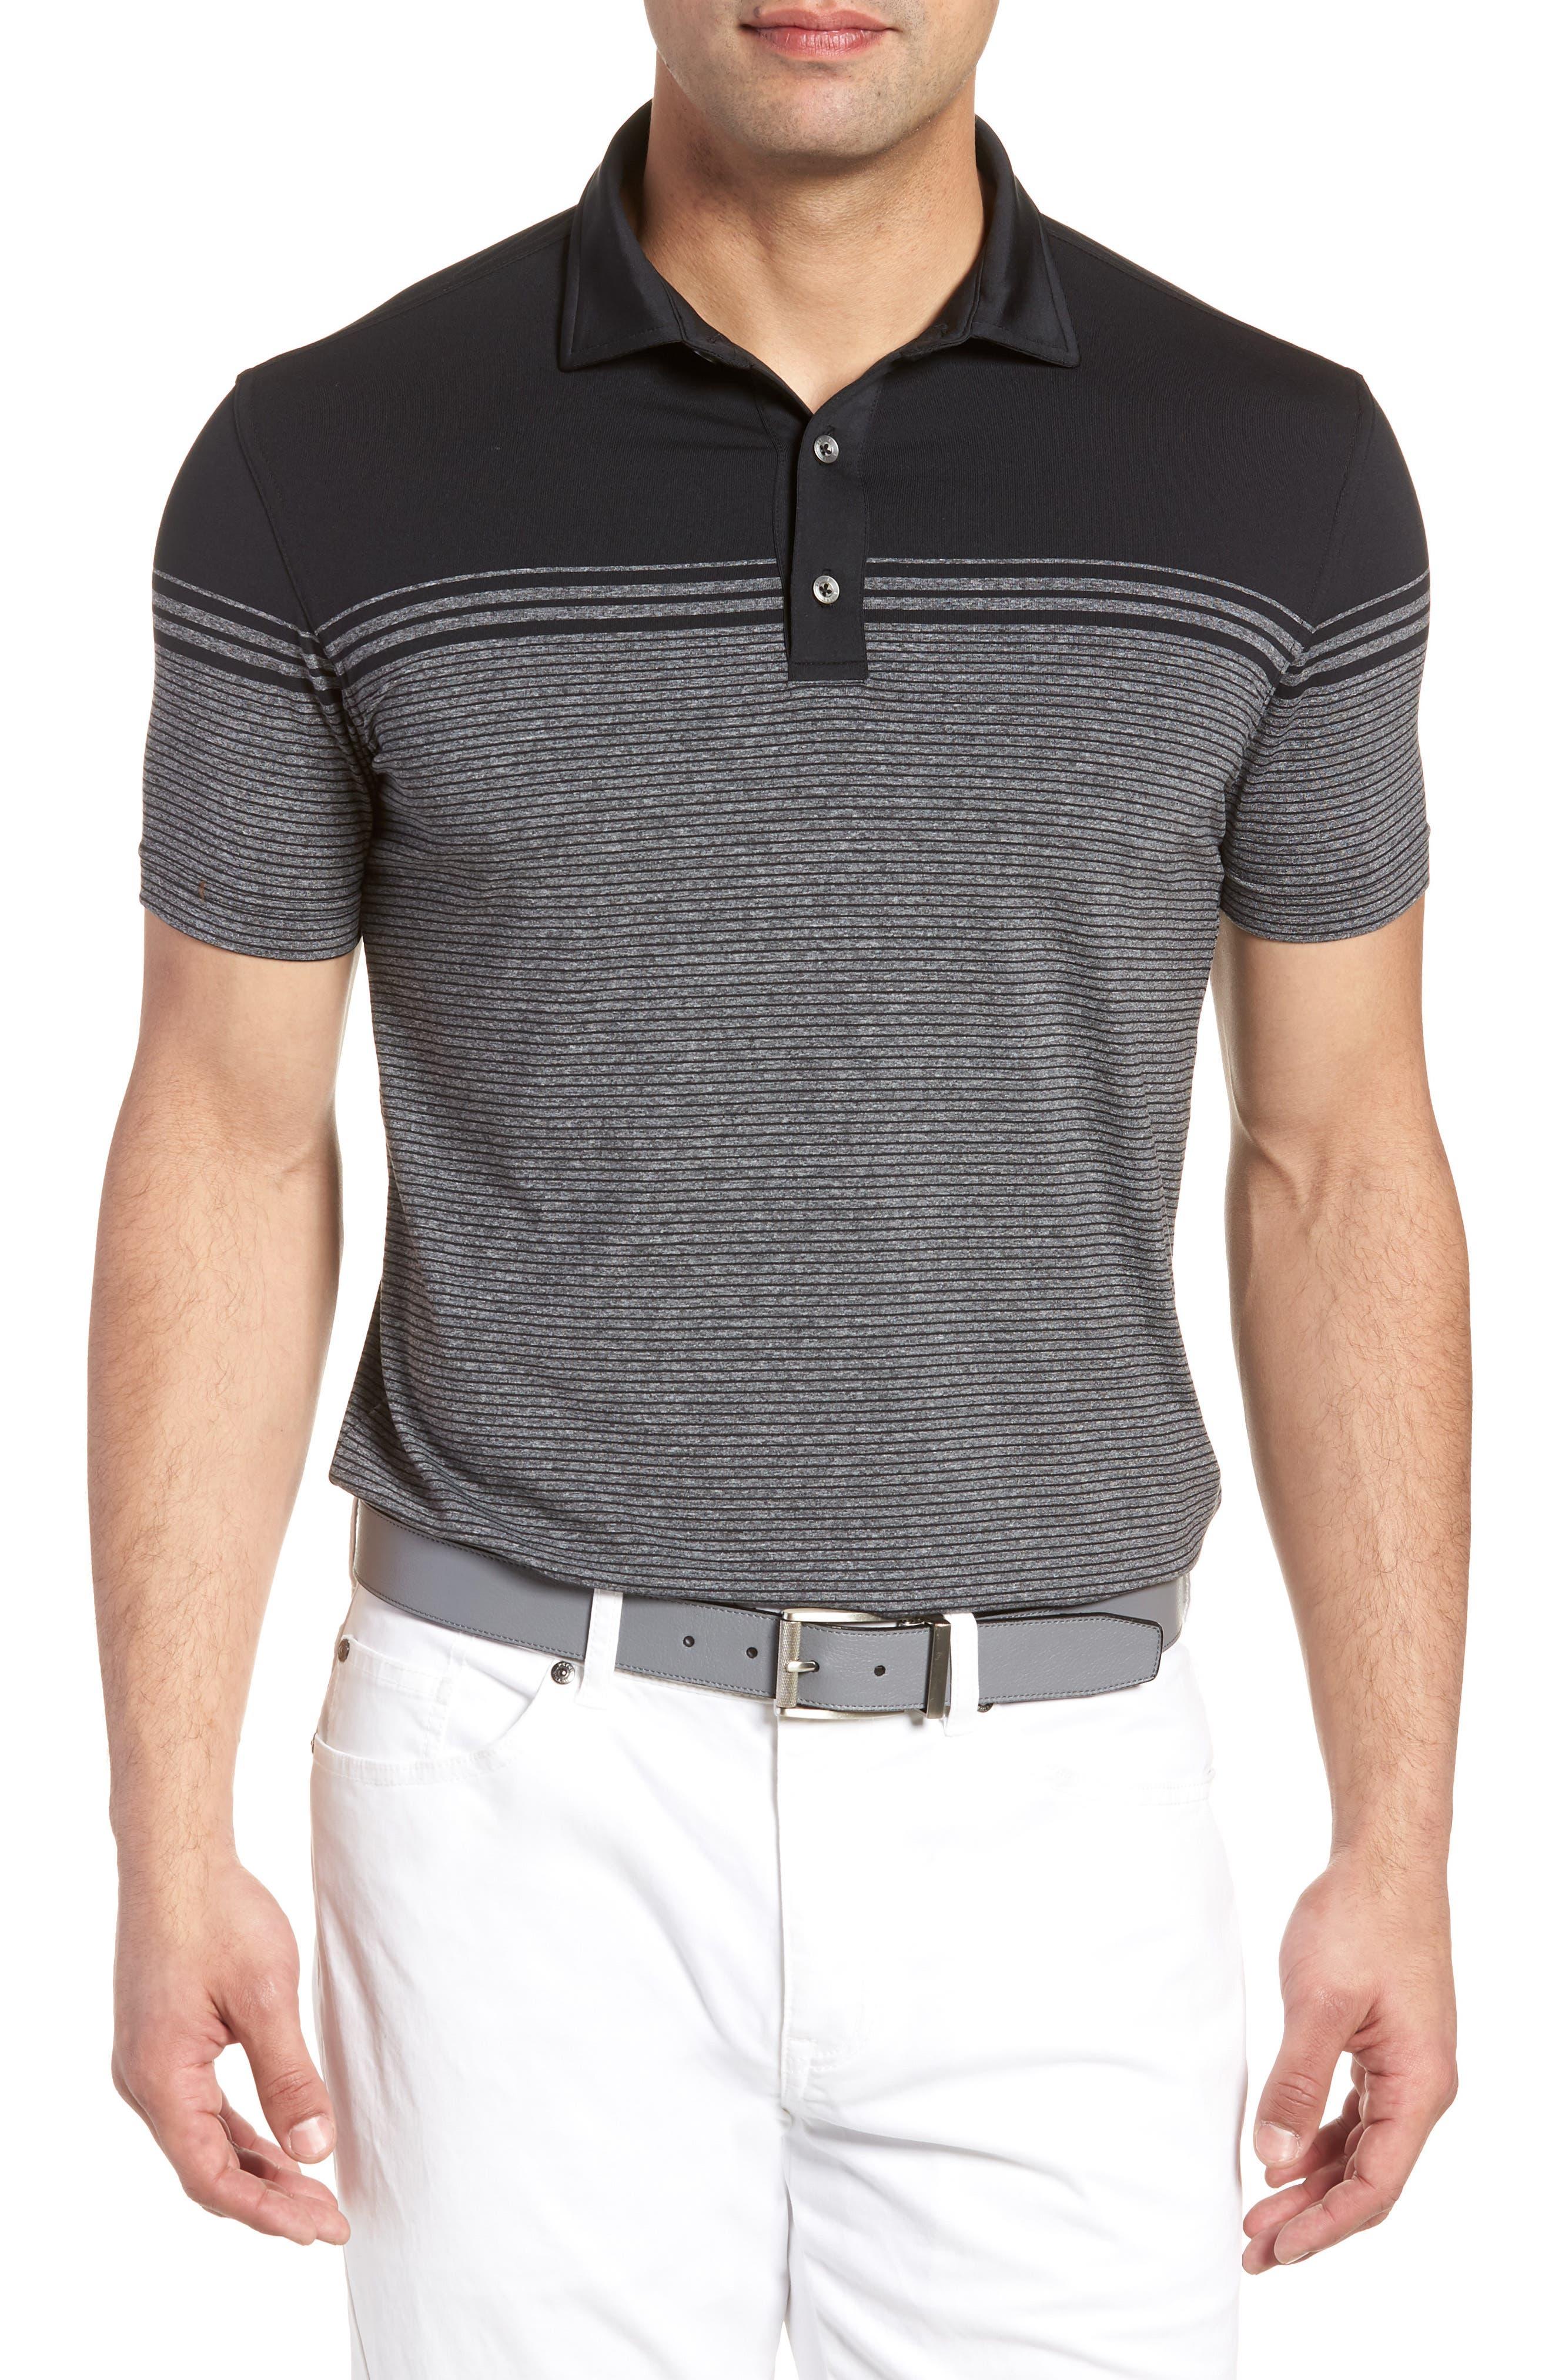 BOBBY JONES R18 Tech Torque Stripe Golf Polo in Black